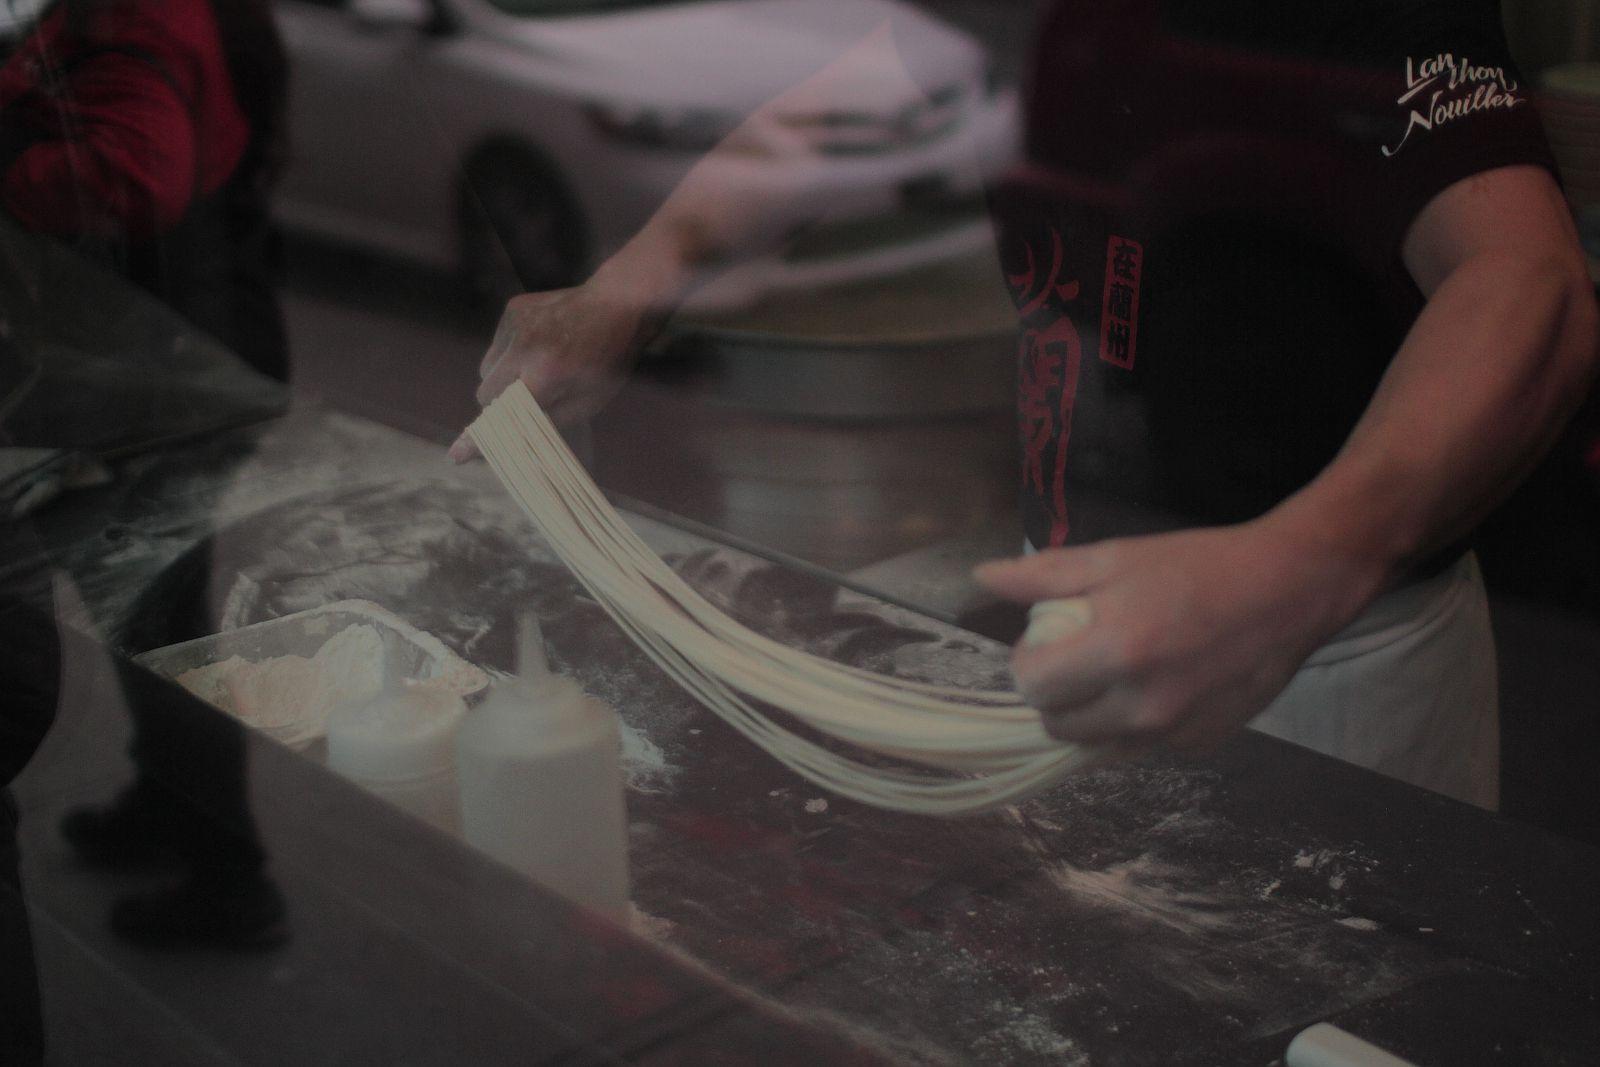 Montreal Chinatown's best cheap eats include the noodles at Nouilles Lao Tzu.